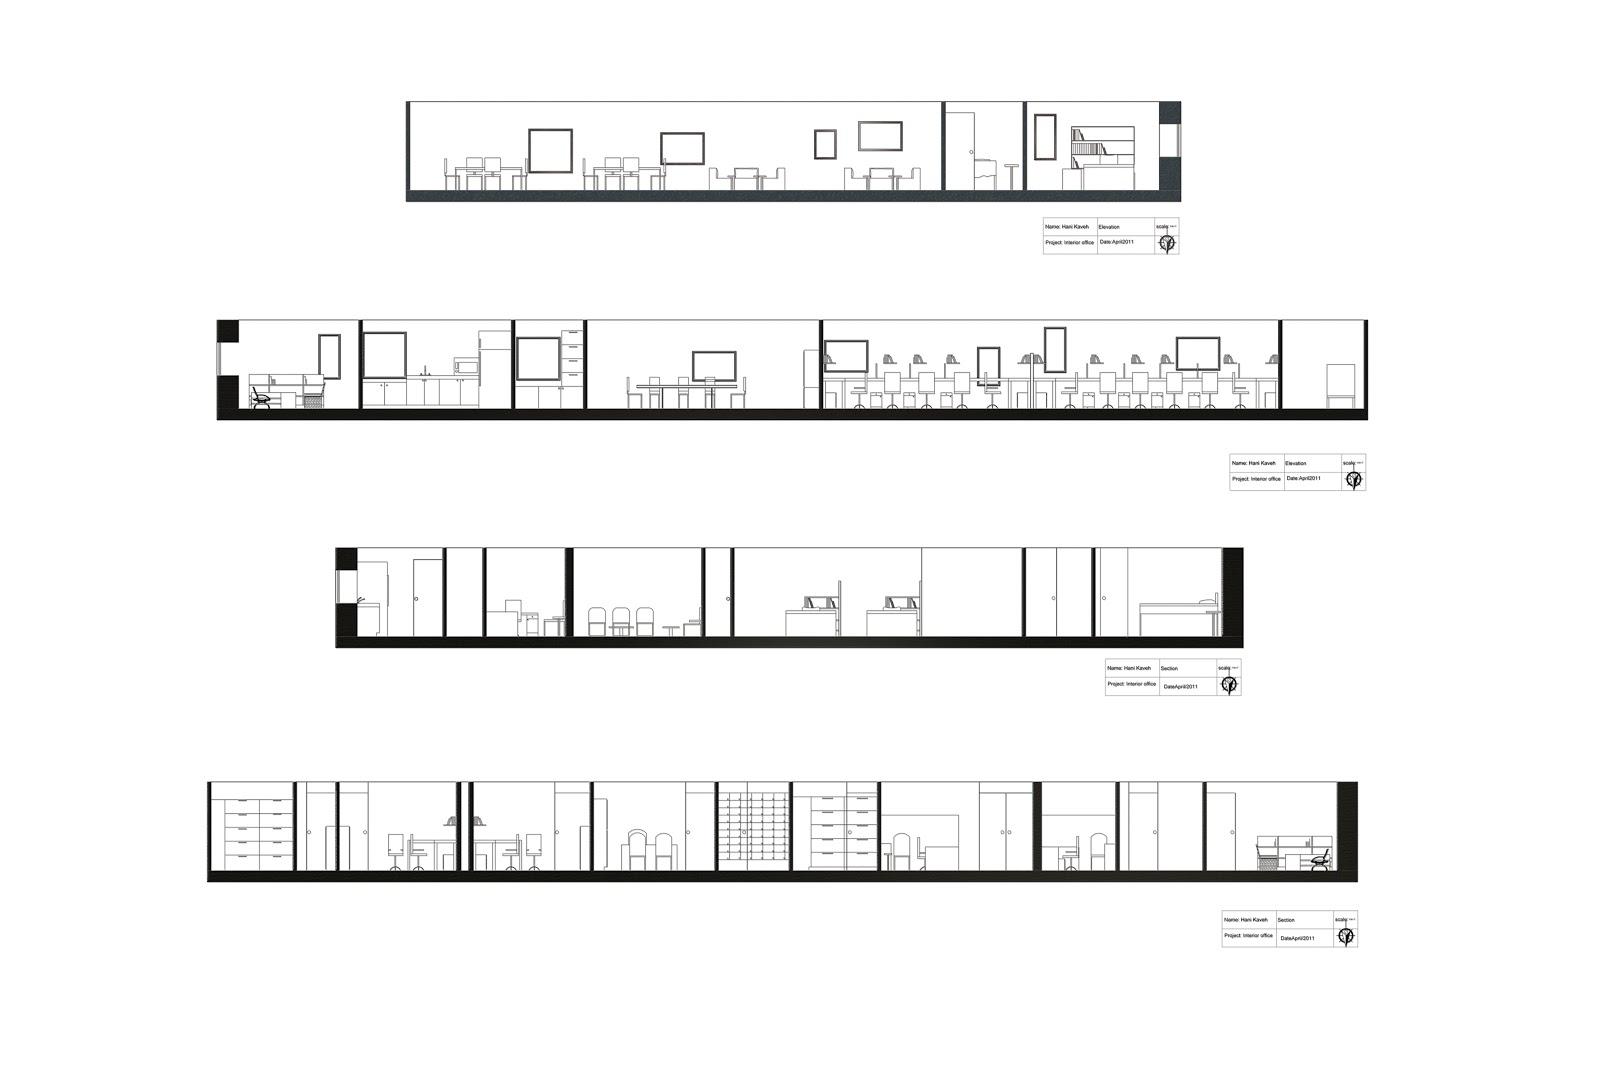 Office Interior And Furnishing Ocad University Hani Kaveh Design